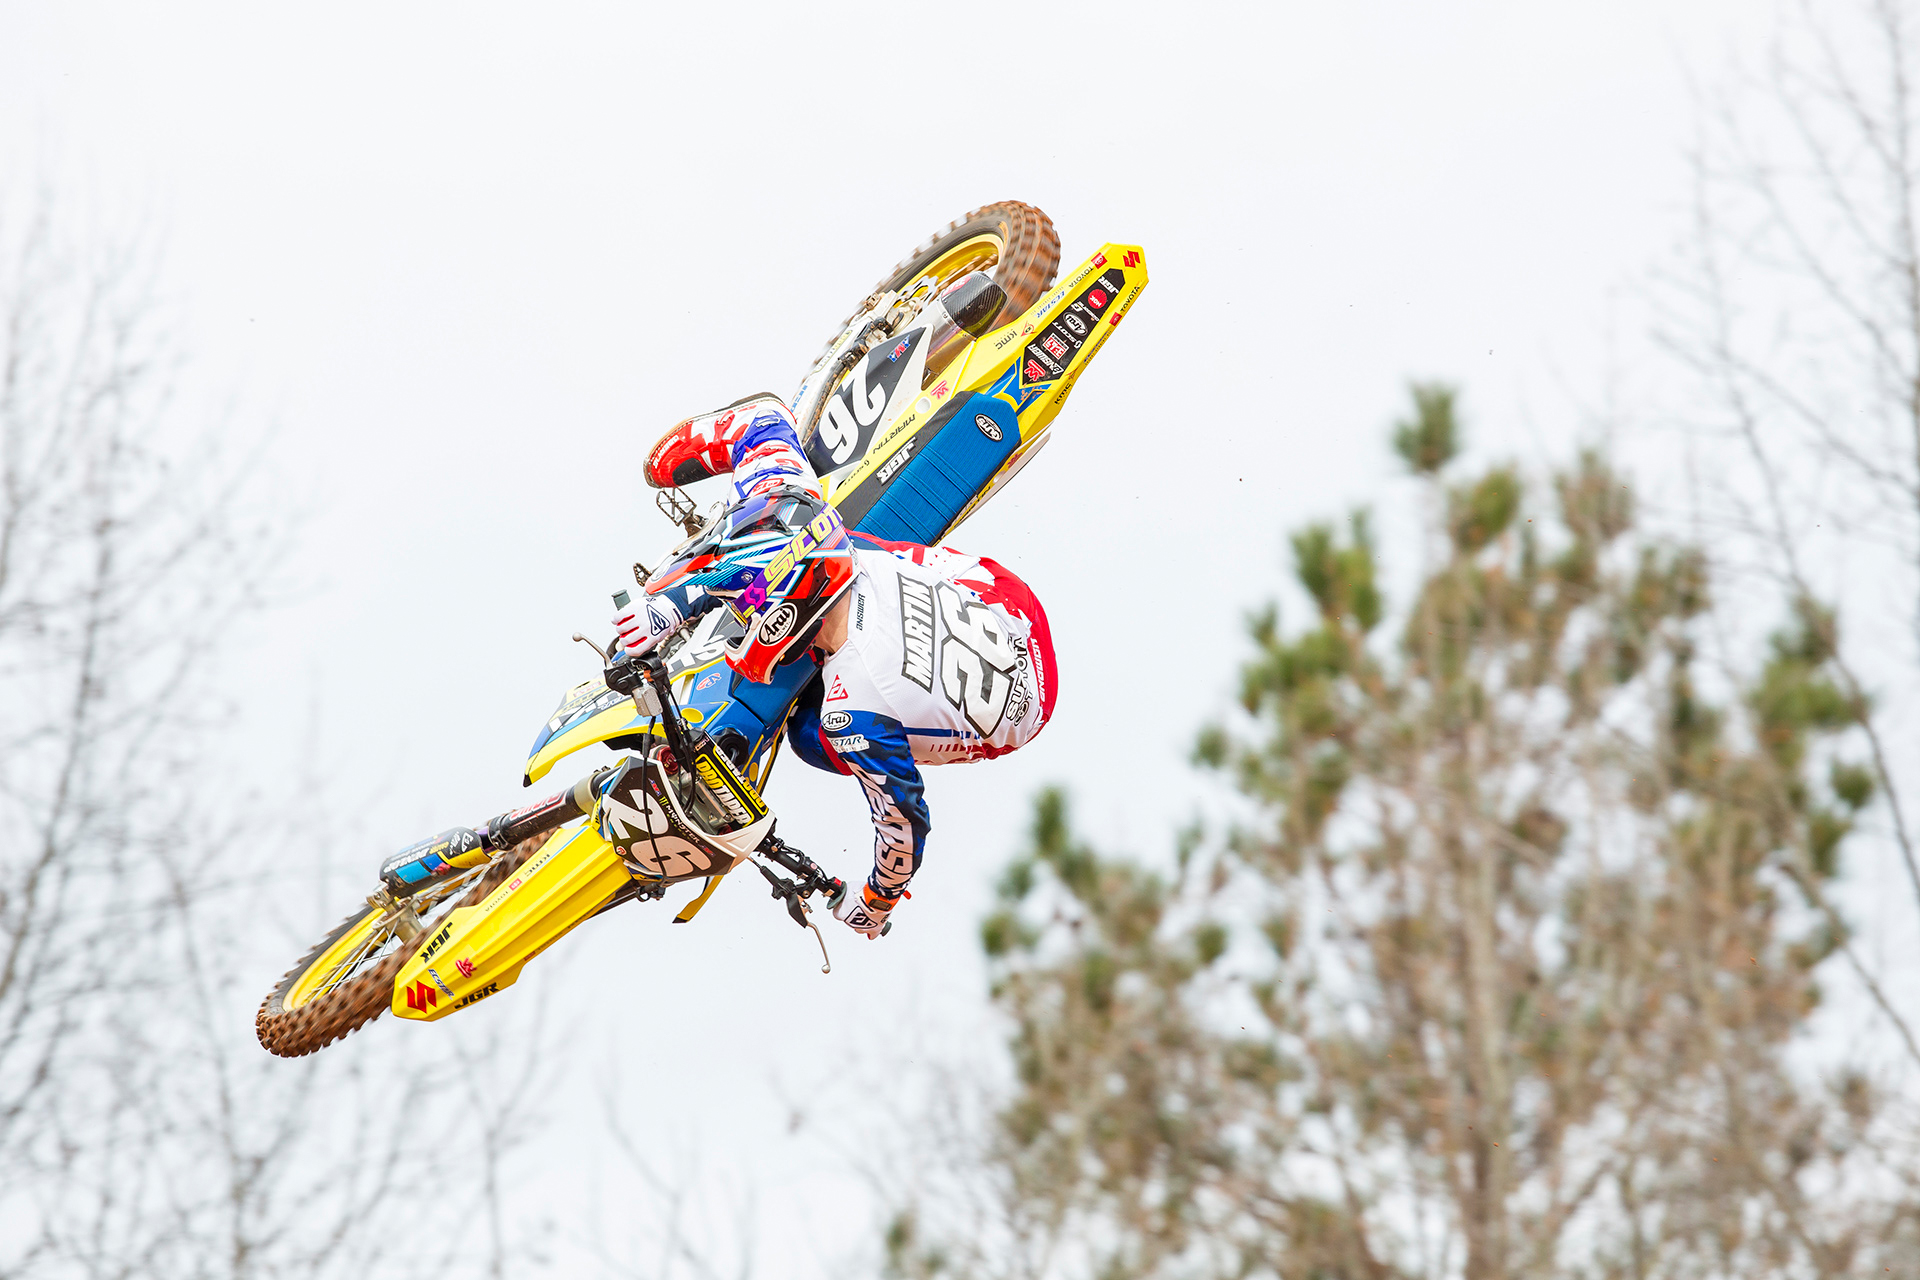 New to Suzuki and JGRMX - Alex Martin (#26)